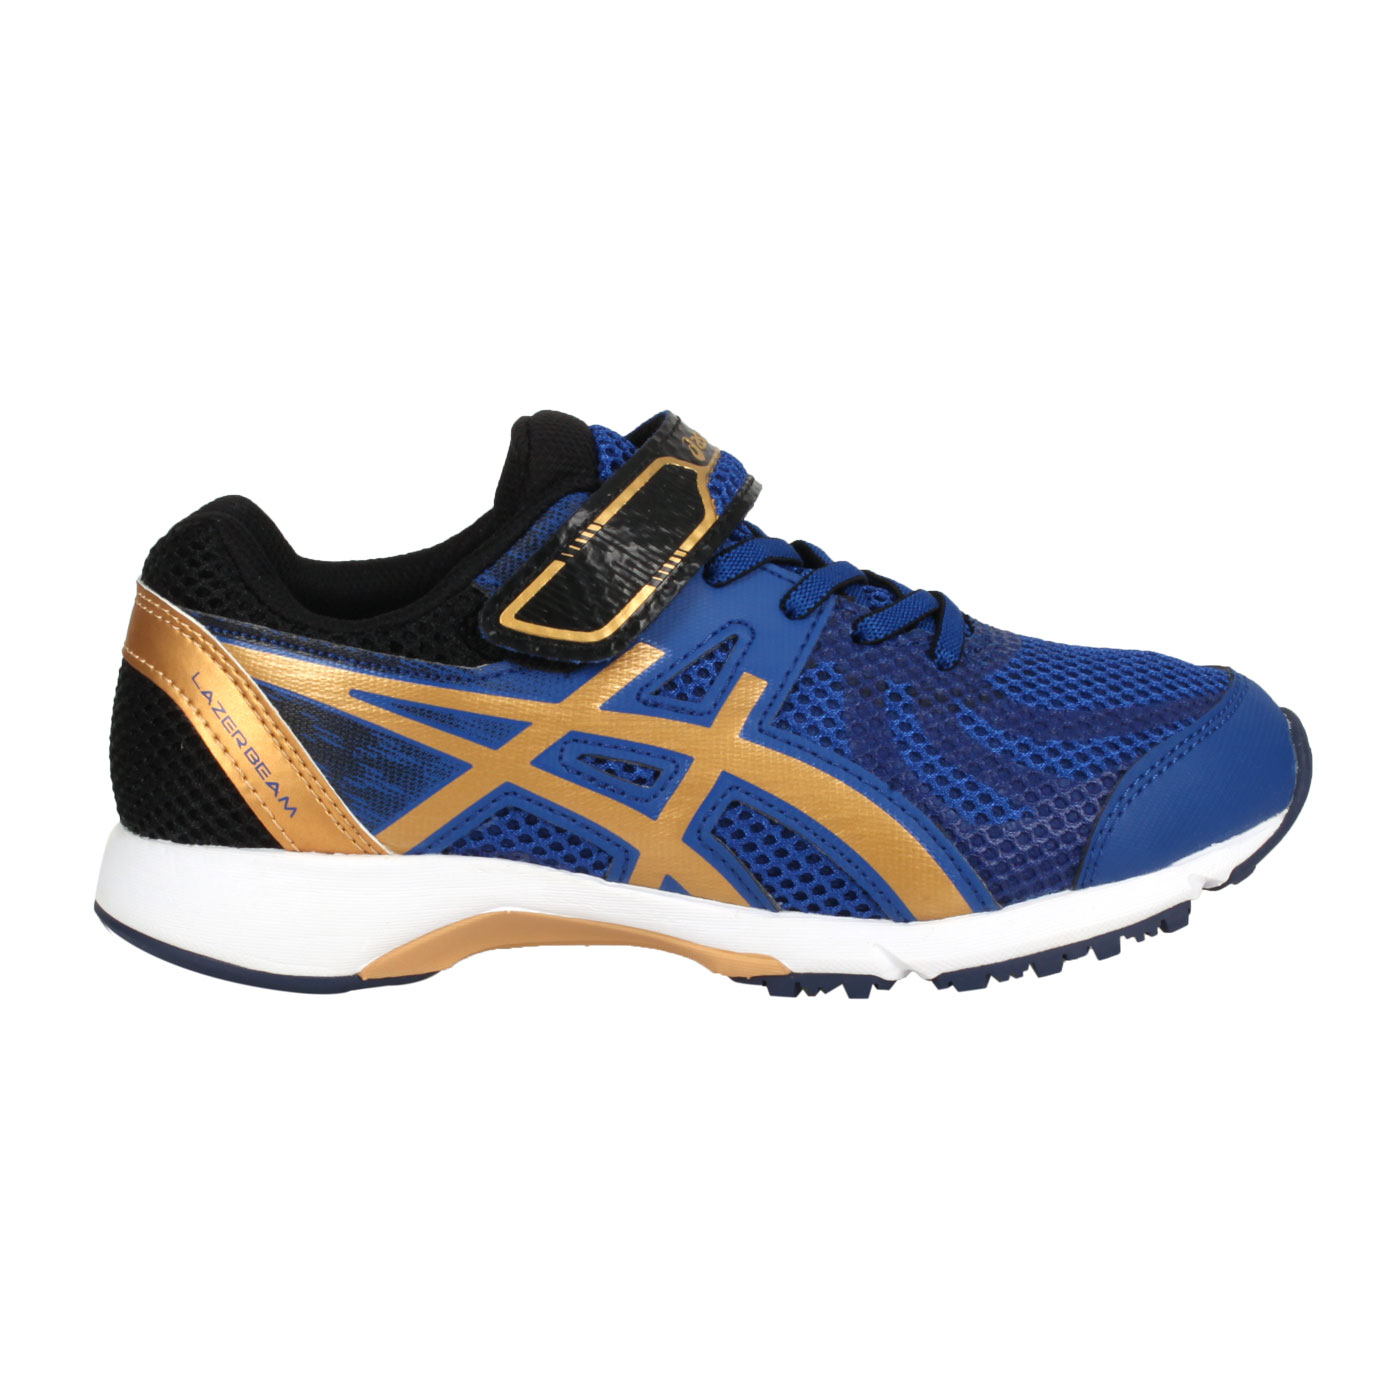 ASICS 大童運動鞋  @LAZERBAM RE-MG@1154A053-400